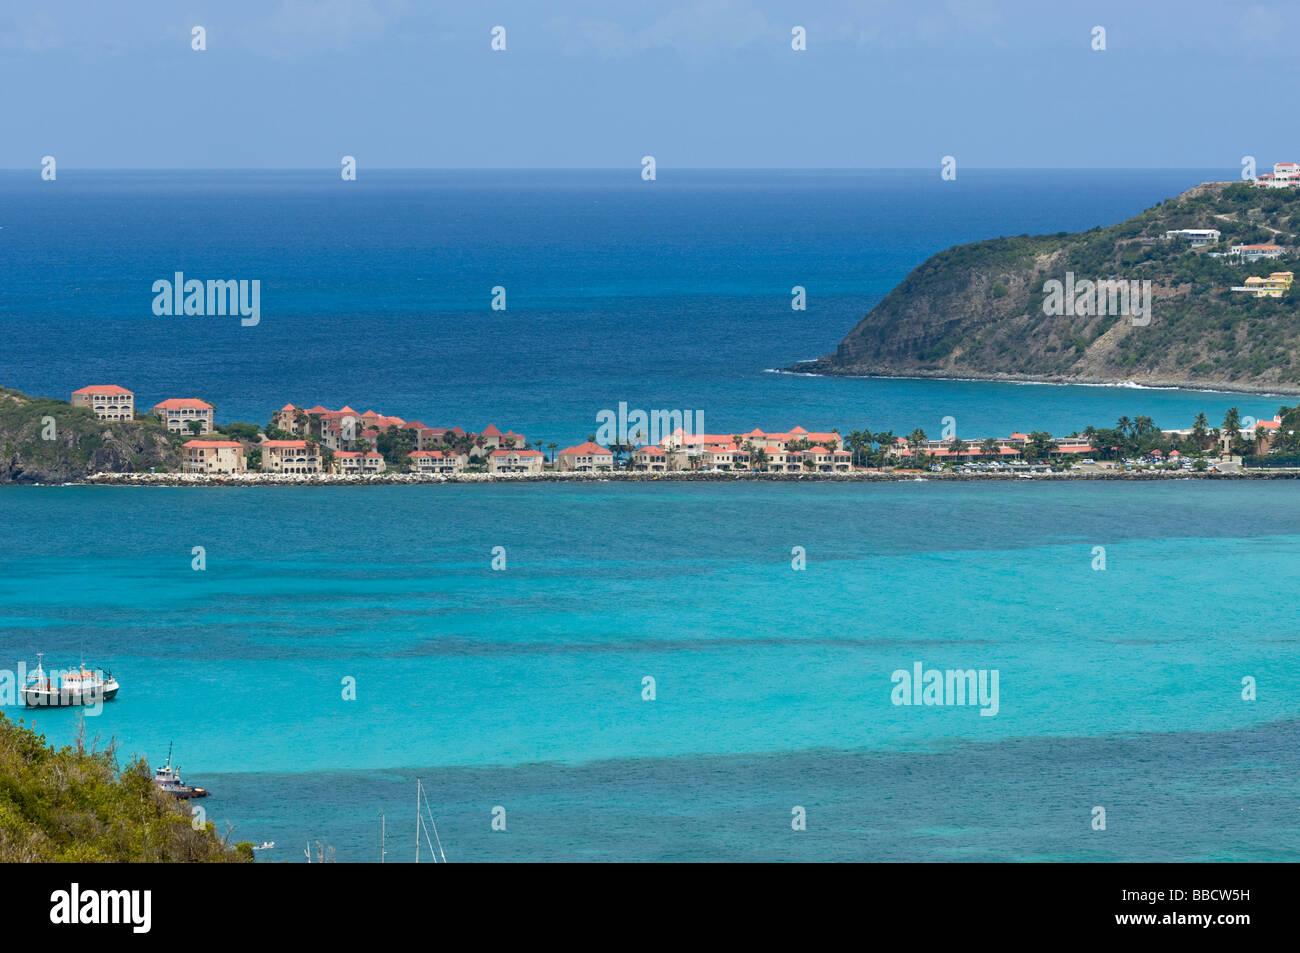 Divi Little Bay Beach Resort St Martin st Maarten Stock Photo ... on